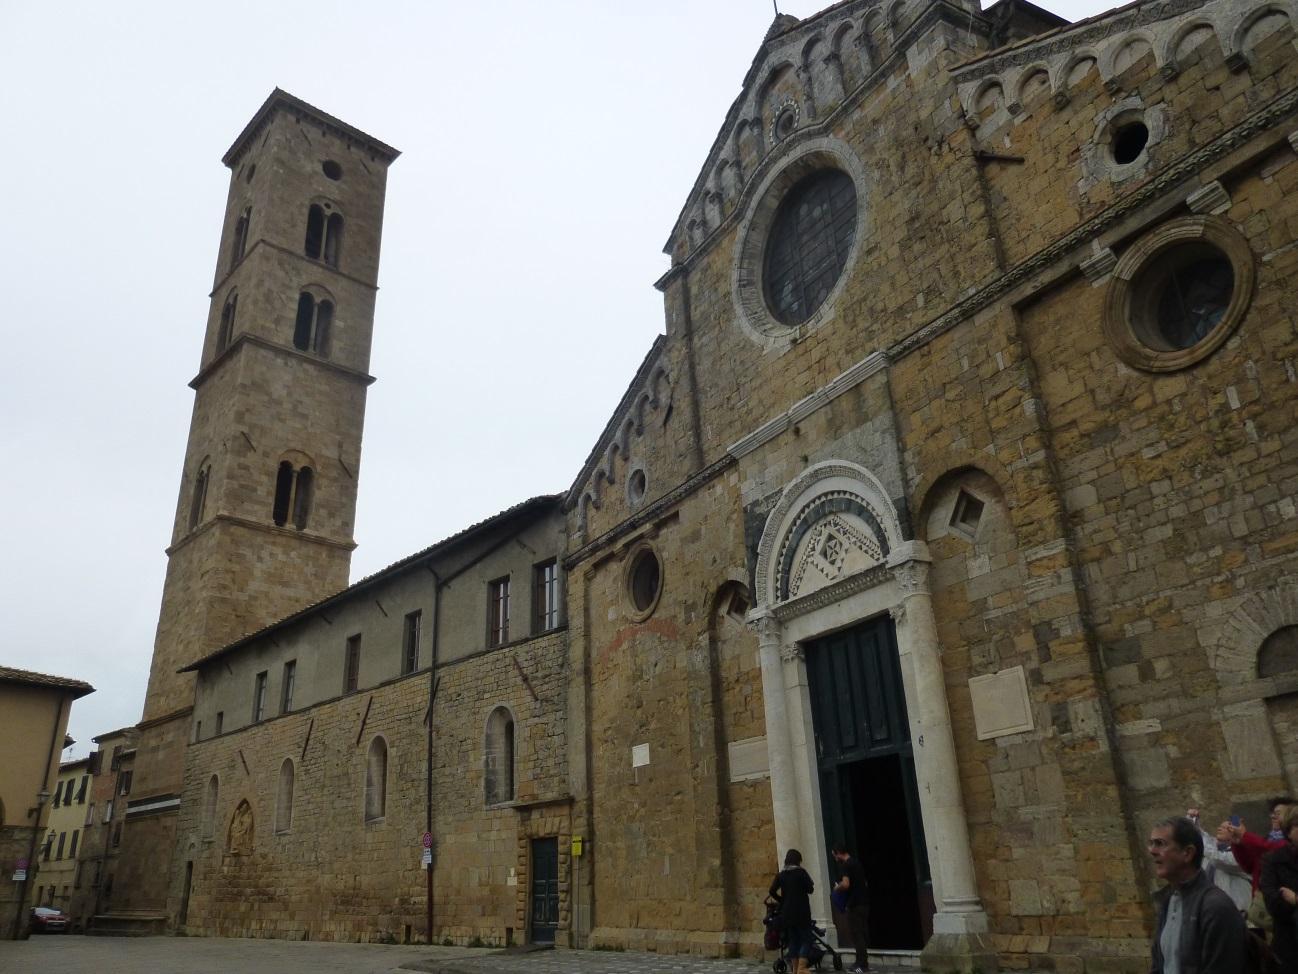 C:\Users\Gonzalo\Desktop\Documentos\Fotografías\La Toscana\103_PANA\103_PANA\P1030290.JPG